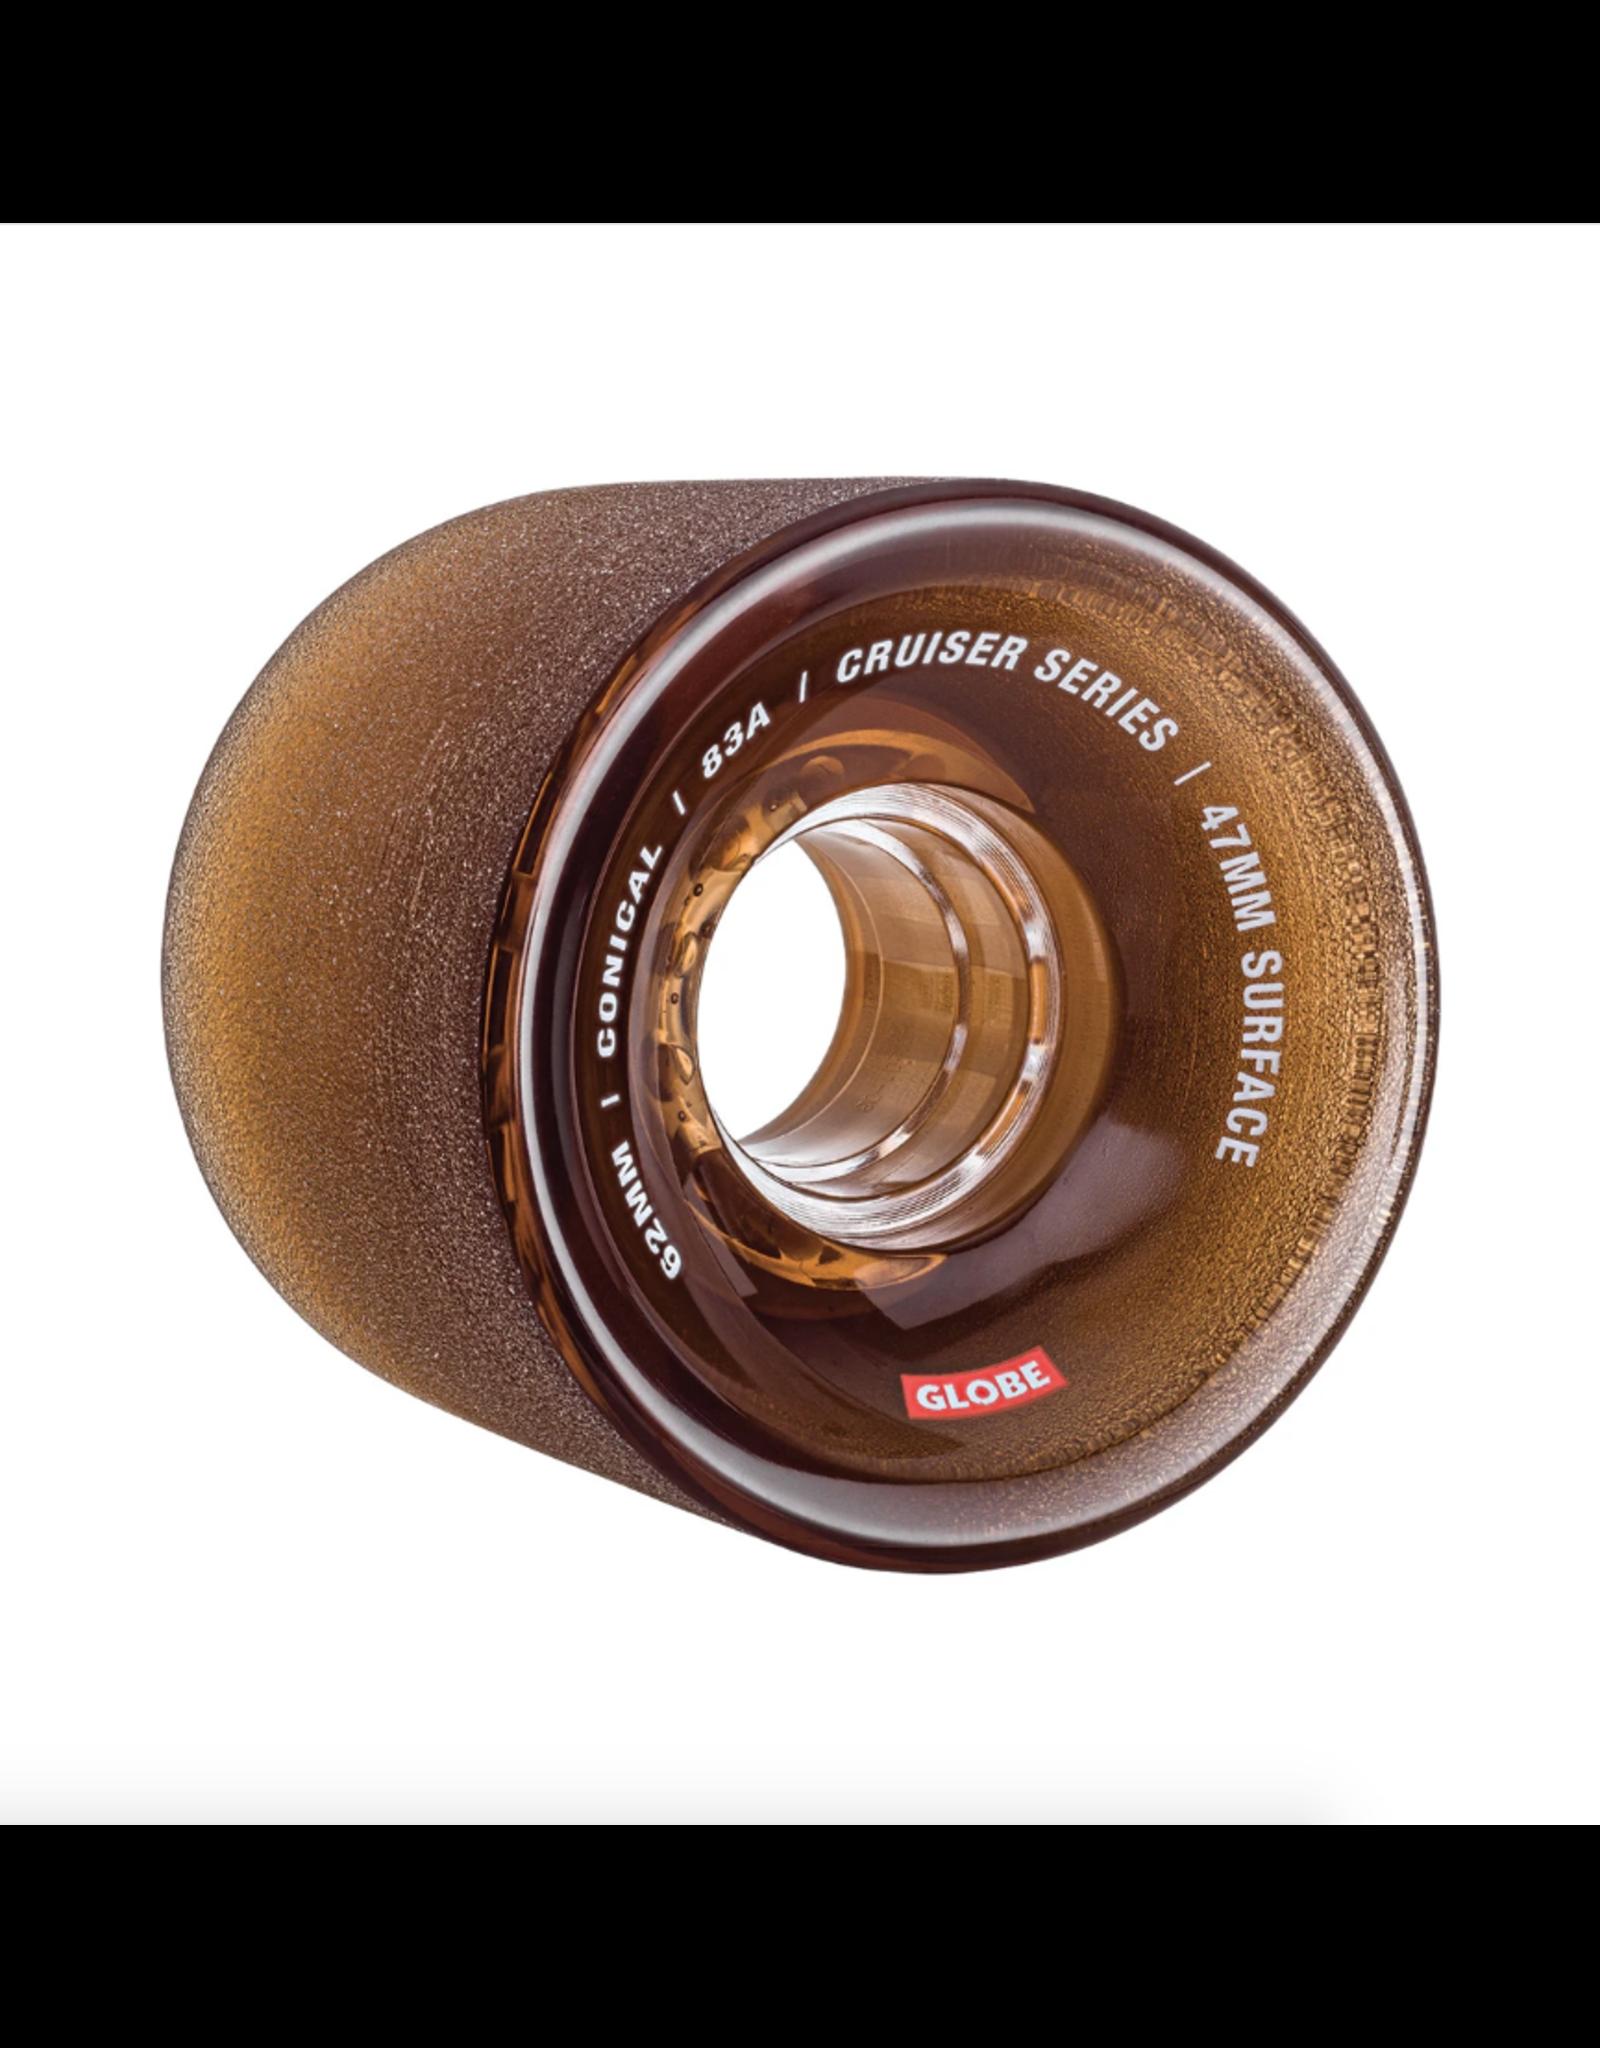 GLOBE Conical Cruiser Wheel 62MM